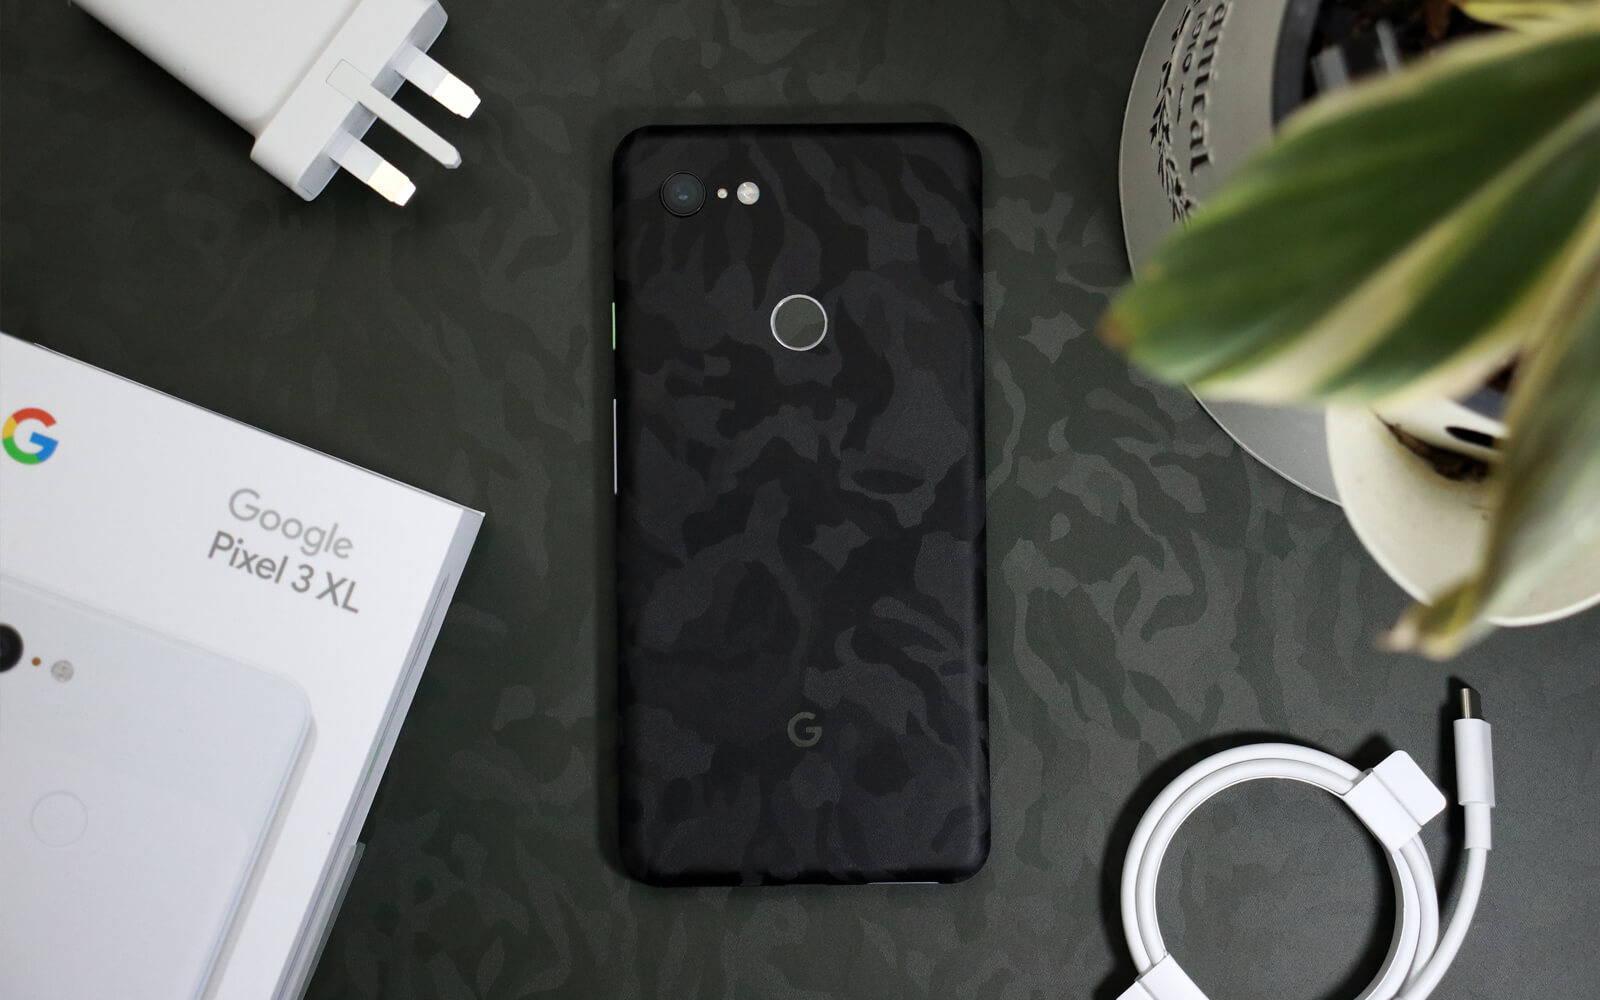 Google Pixel 3 XL Black Camo and Green Camo Skins